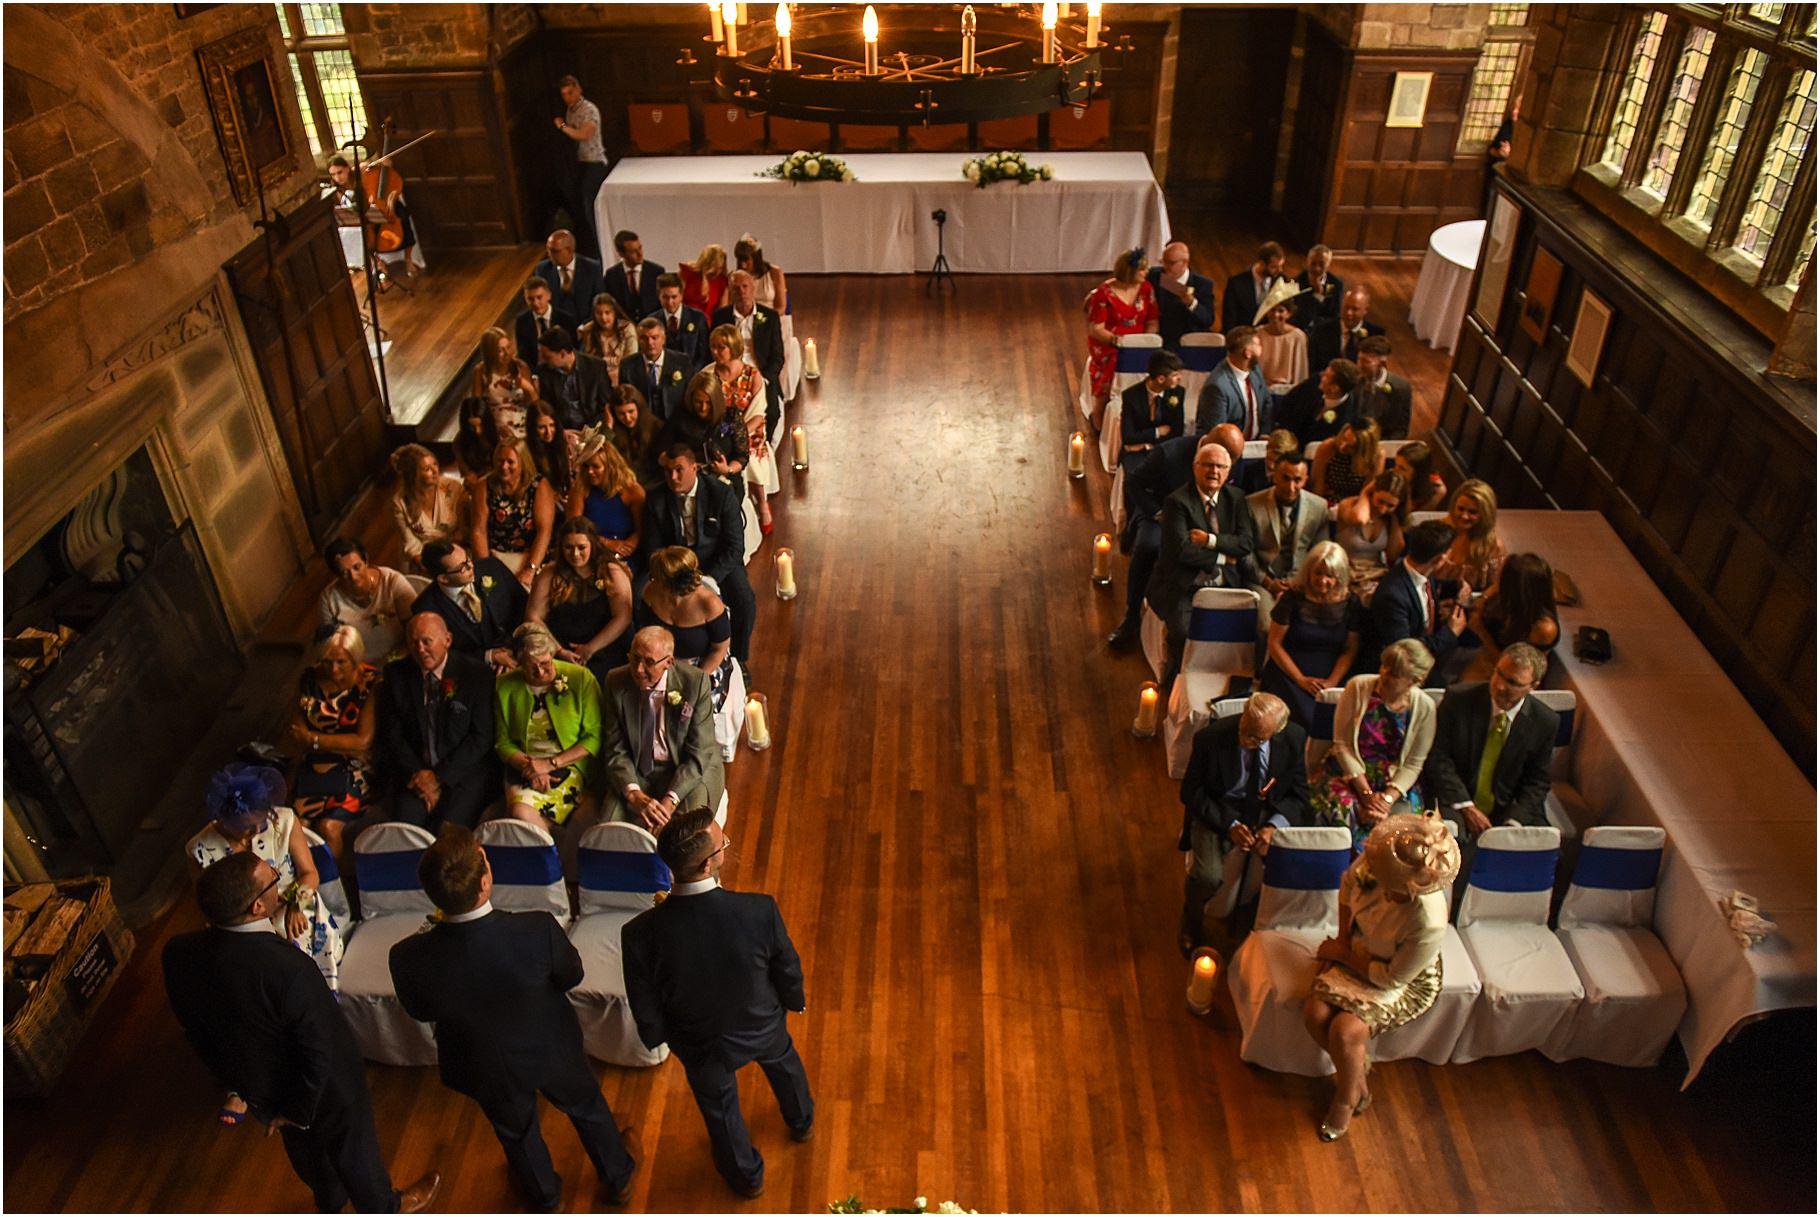 hoghton-tower-wedding-20.jpg